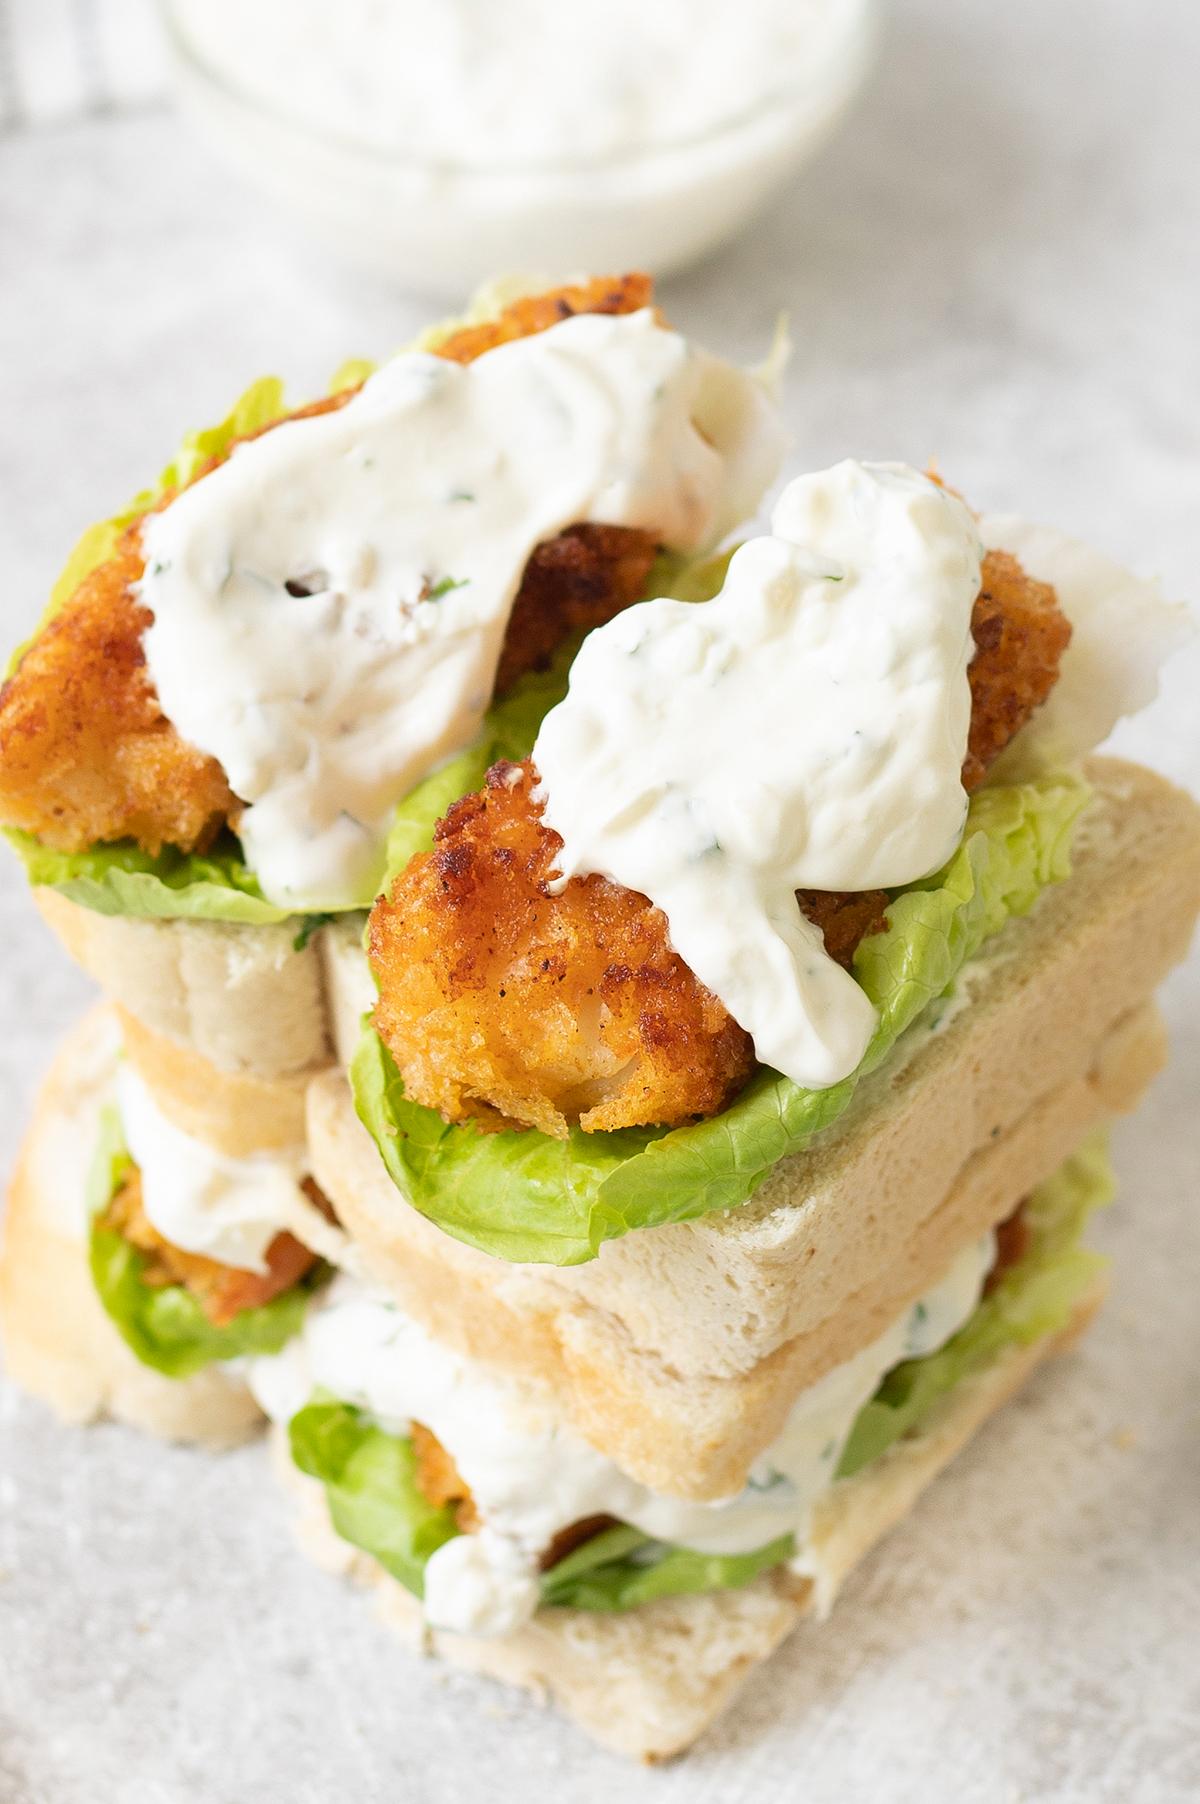 Fish Finger Sandwich With Sour Cream Sauce